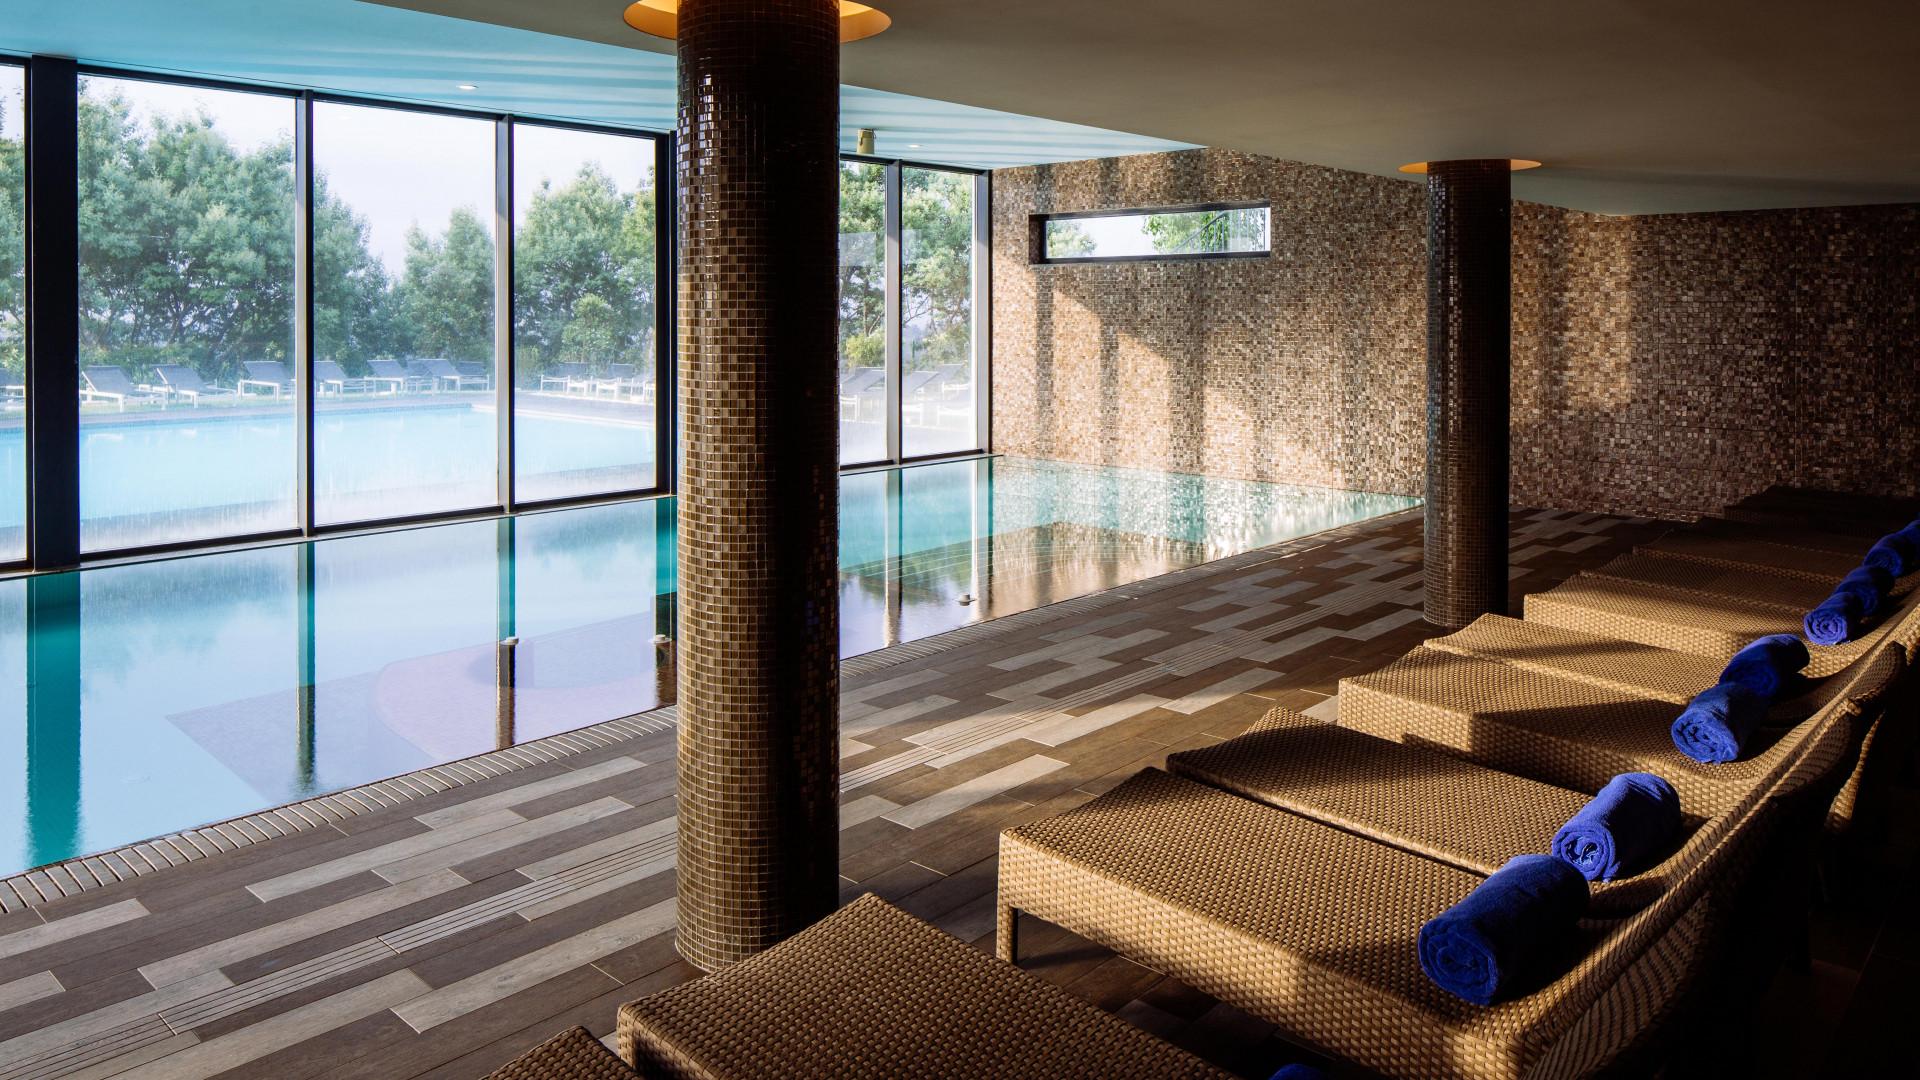 Spa at Macdonald Monchique Resort & Spa, Algarve